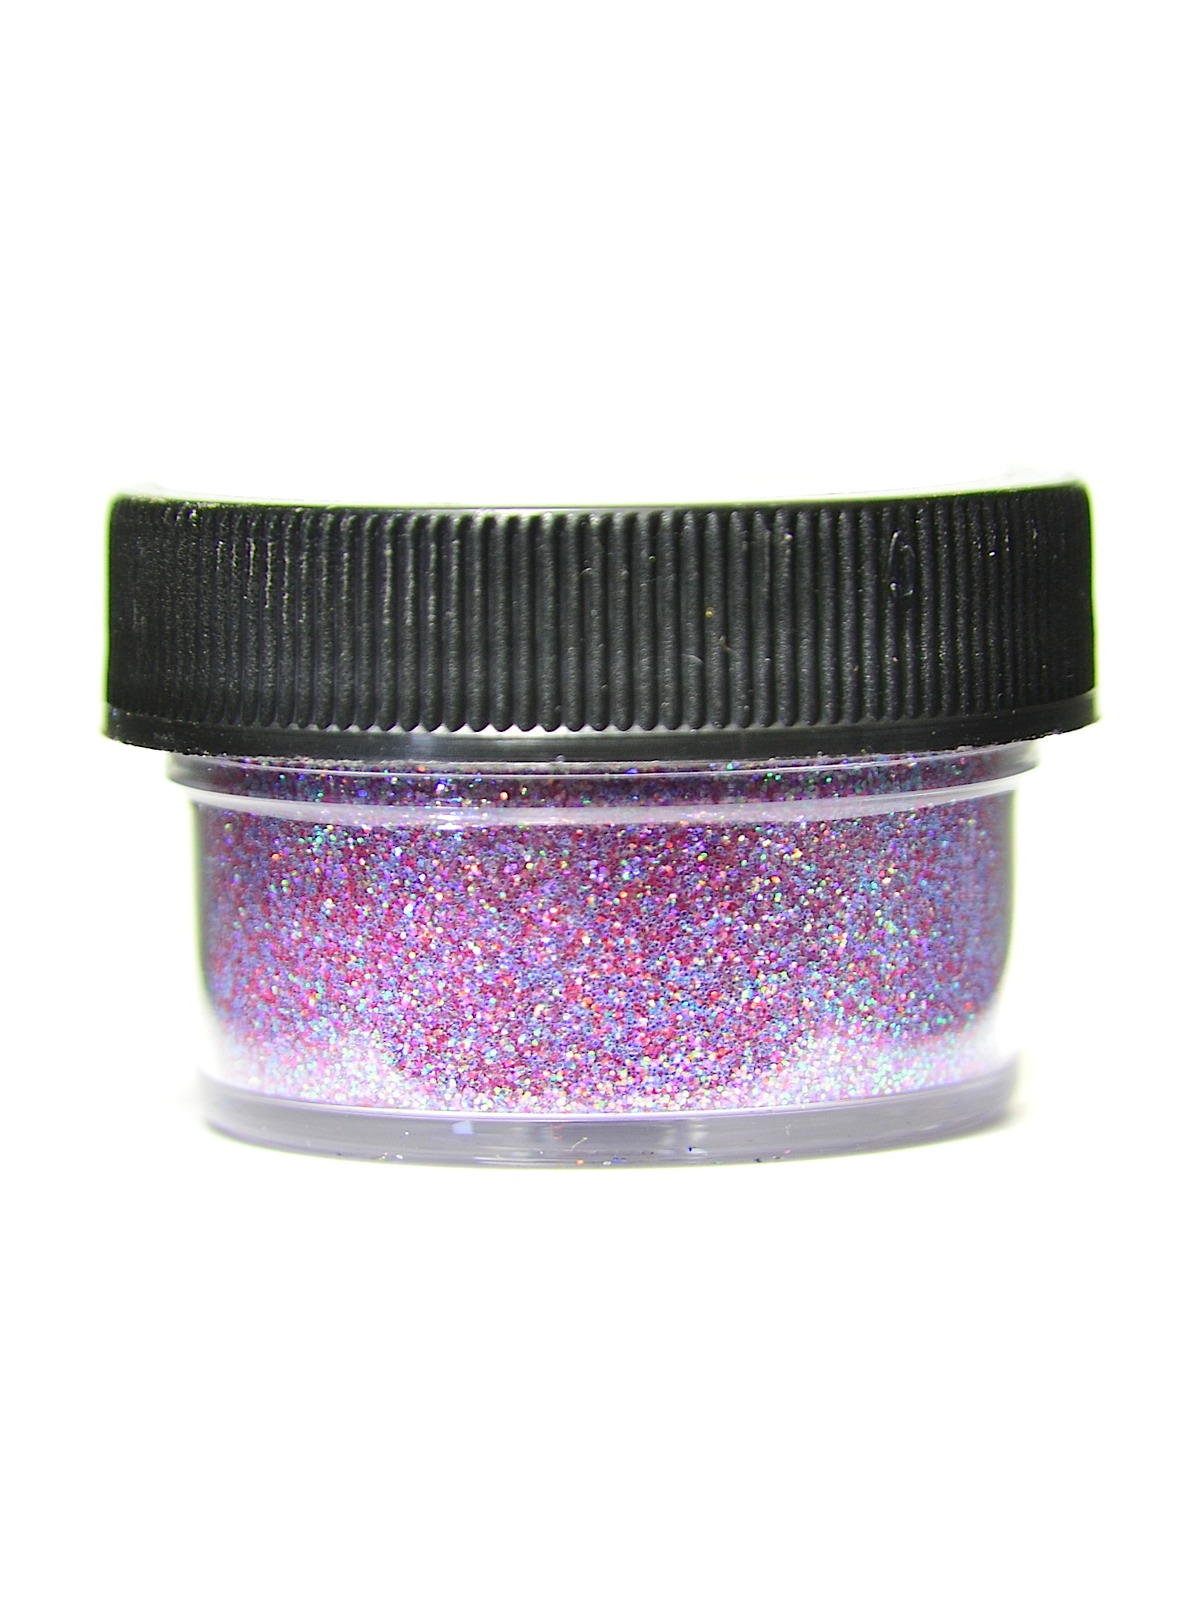 Ultrafine Transparent Glitter Amethyst 1 2 Oz. Jar